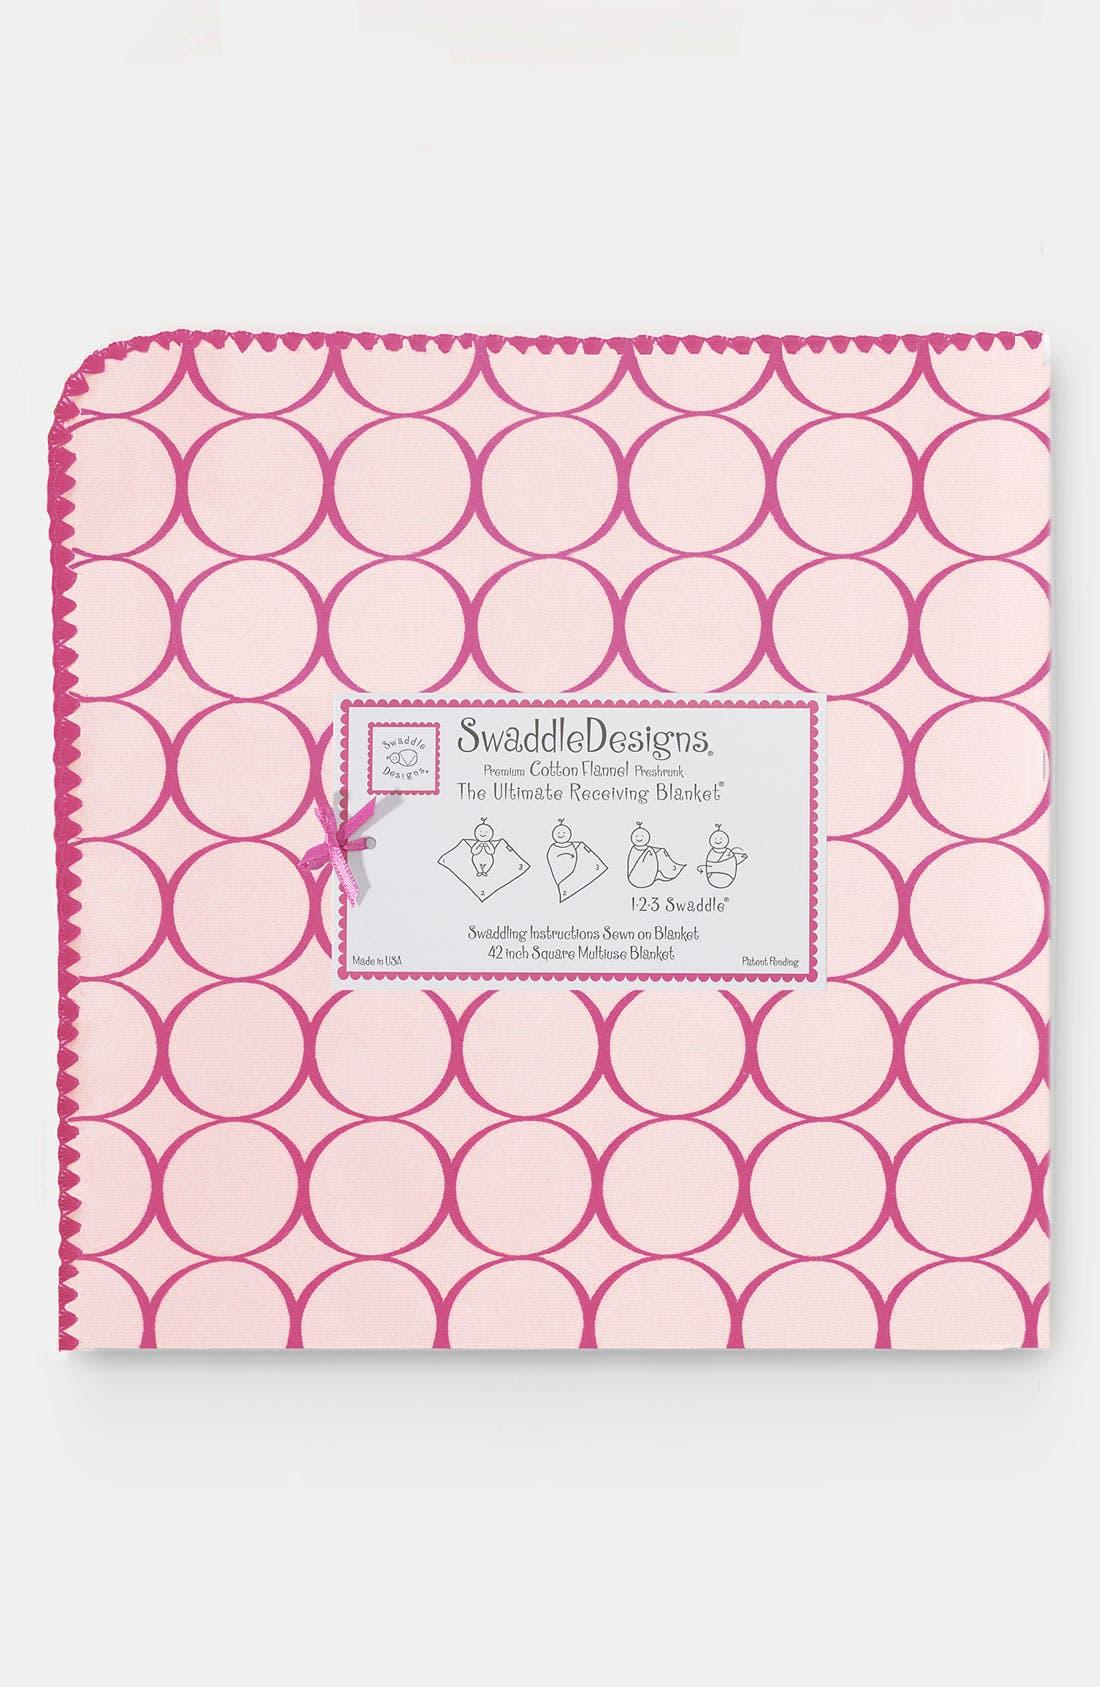 Alternate Image 1 Selected - Swaddle Designs 'Ultimate' Receiving Blanket